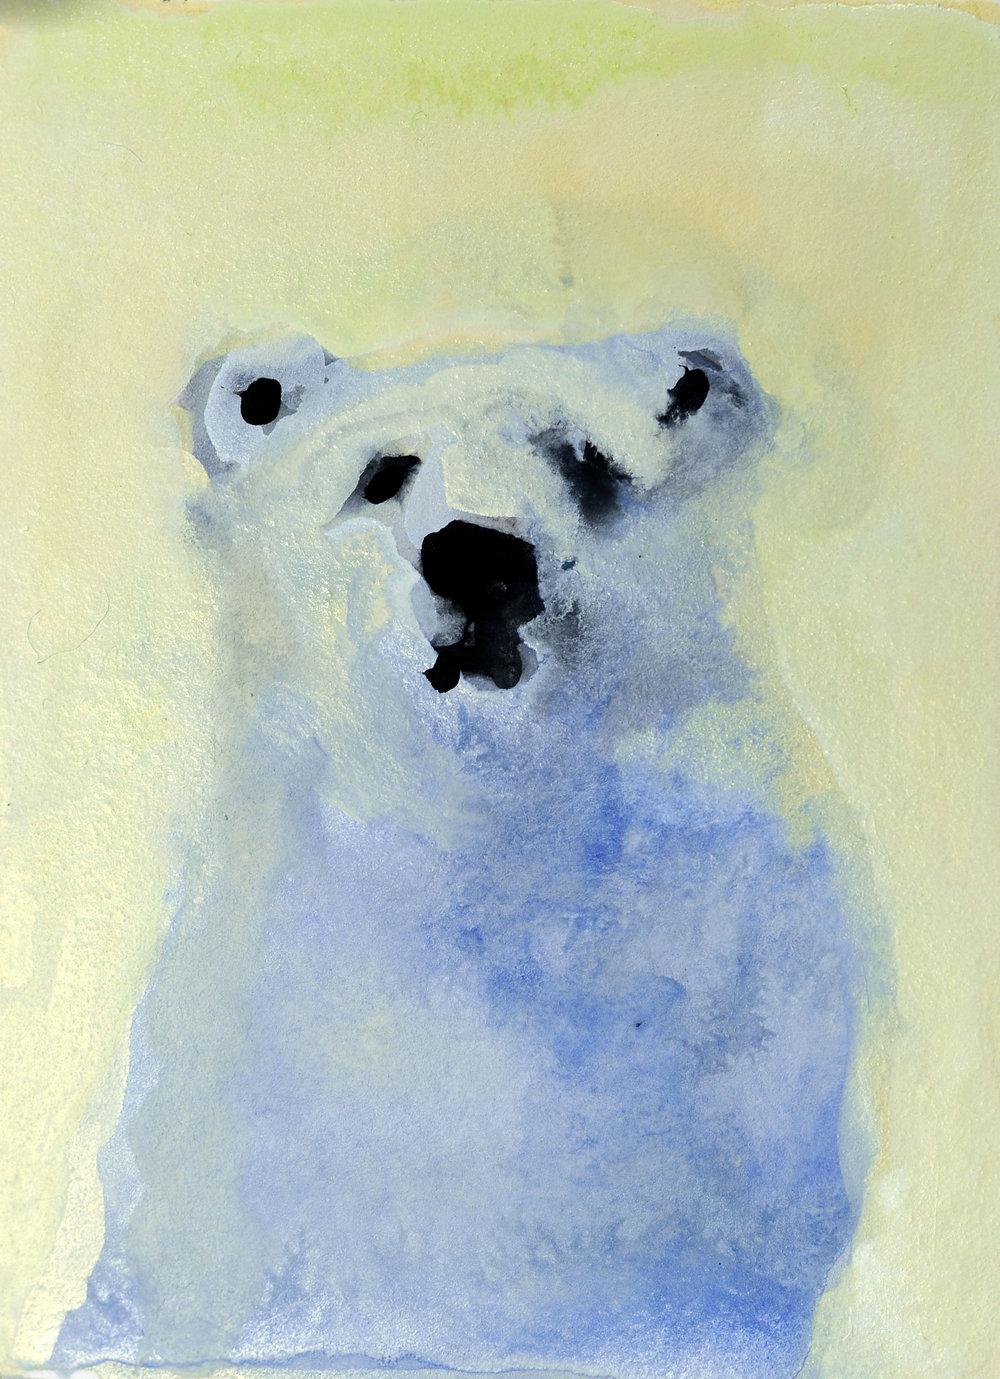 REBECCA_KINKEAD_polar bear no. 4_4x3 inset on 11x7.5 paper.jpg